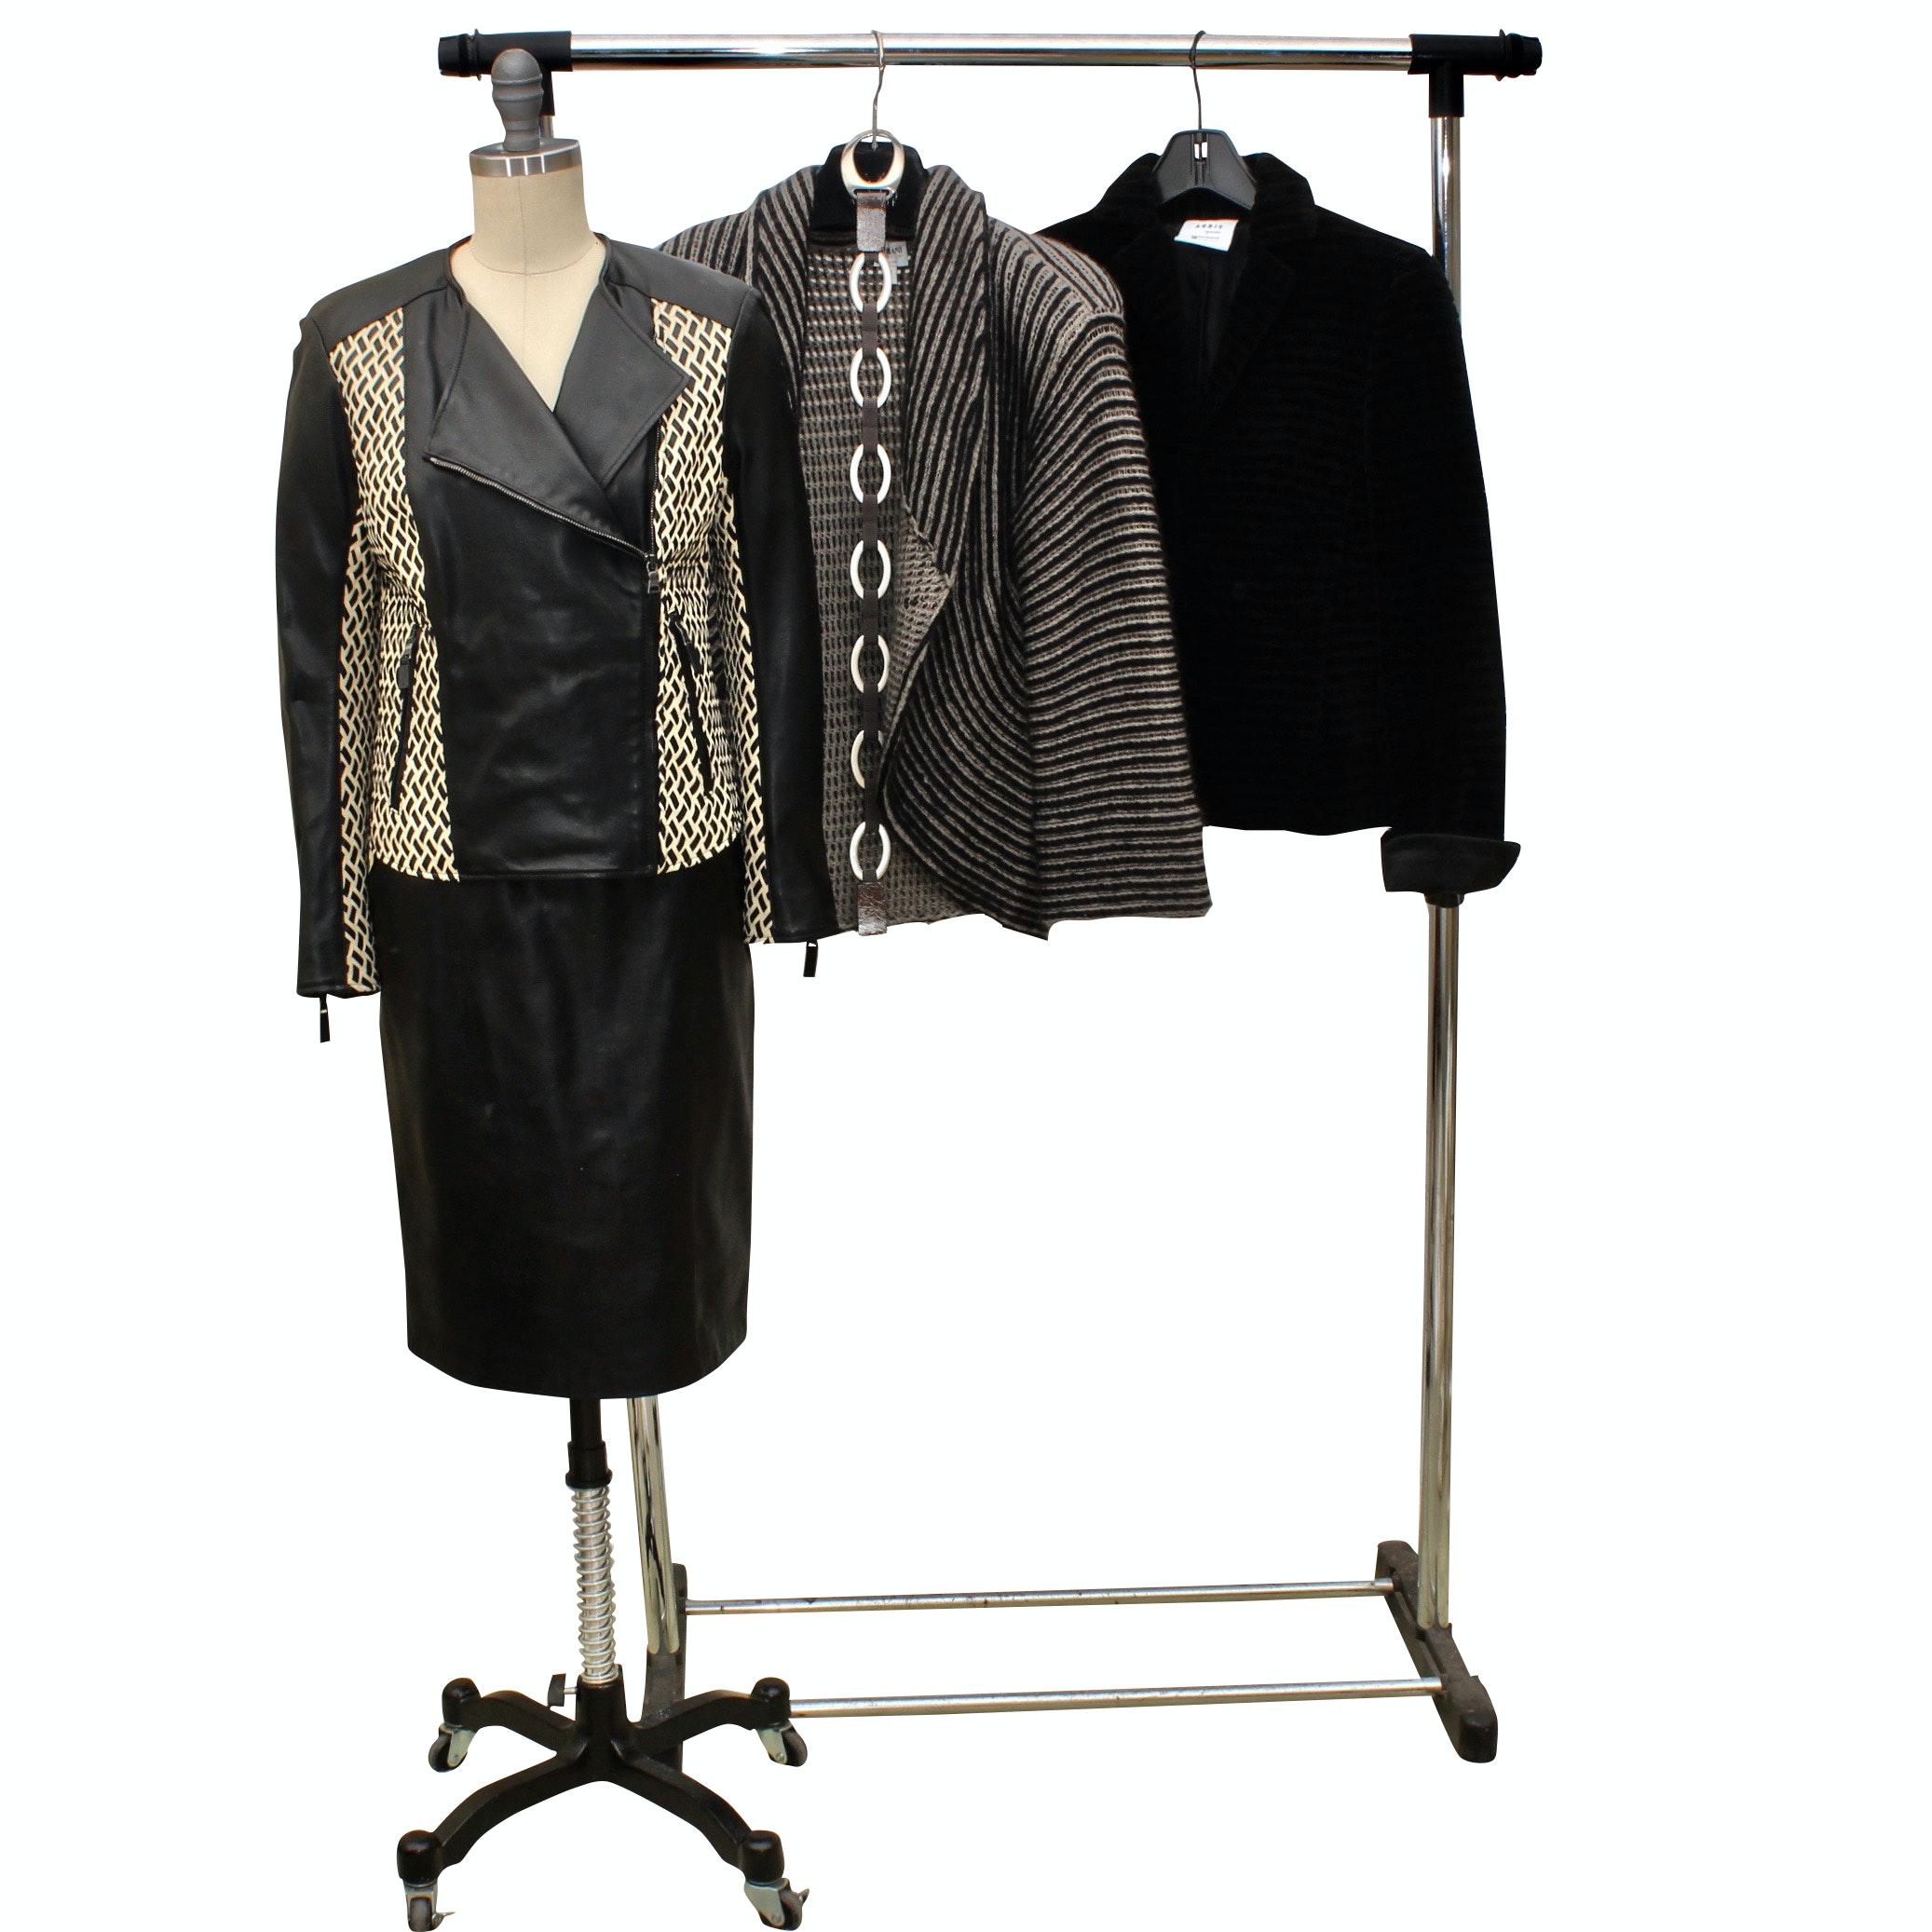 Women's Italian Jackets Including Armani, Etro and Akris